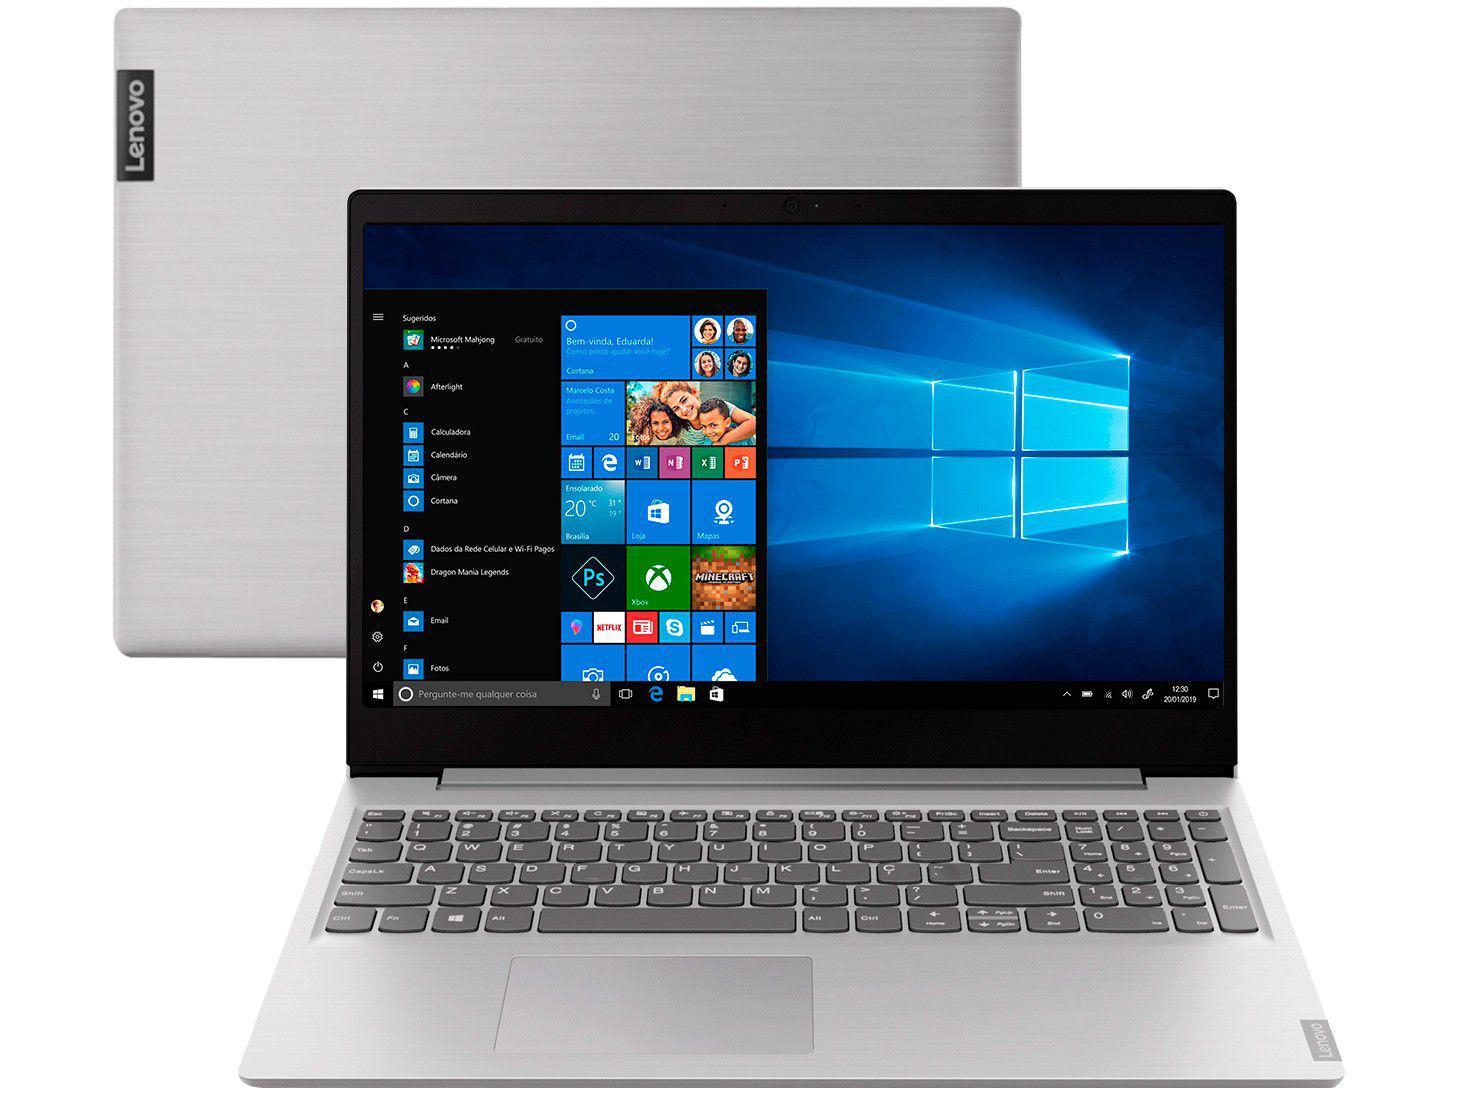 Notebook Lenovo Ideapad S145 82DJ0002BR - Intel Core i3 4GB 1TB LCD Windows 10 Home